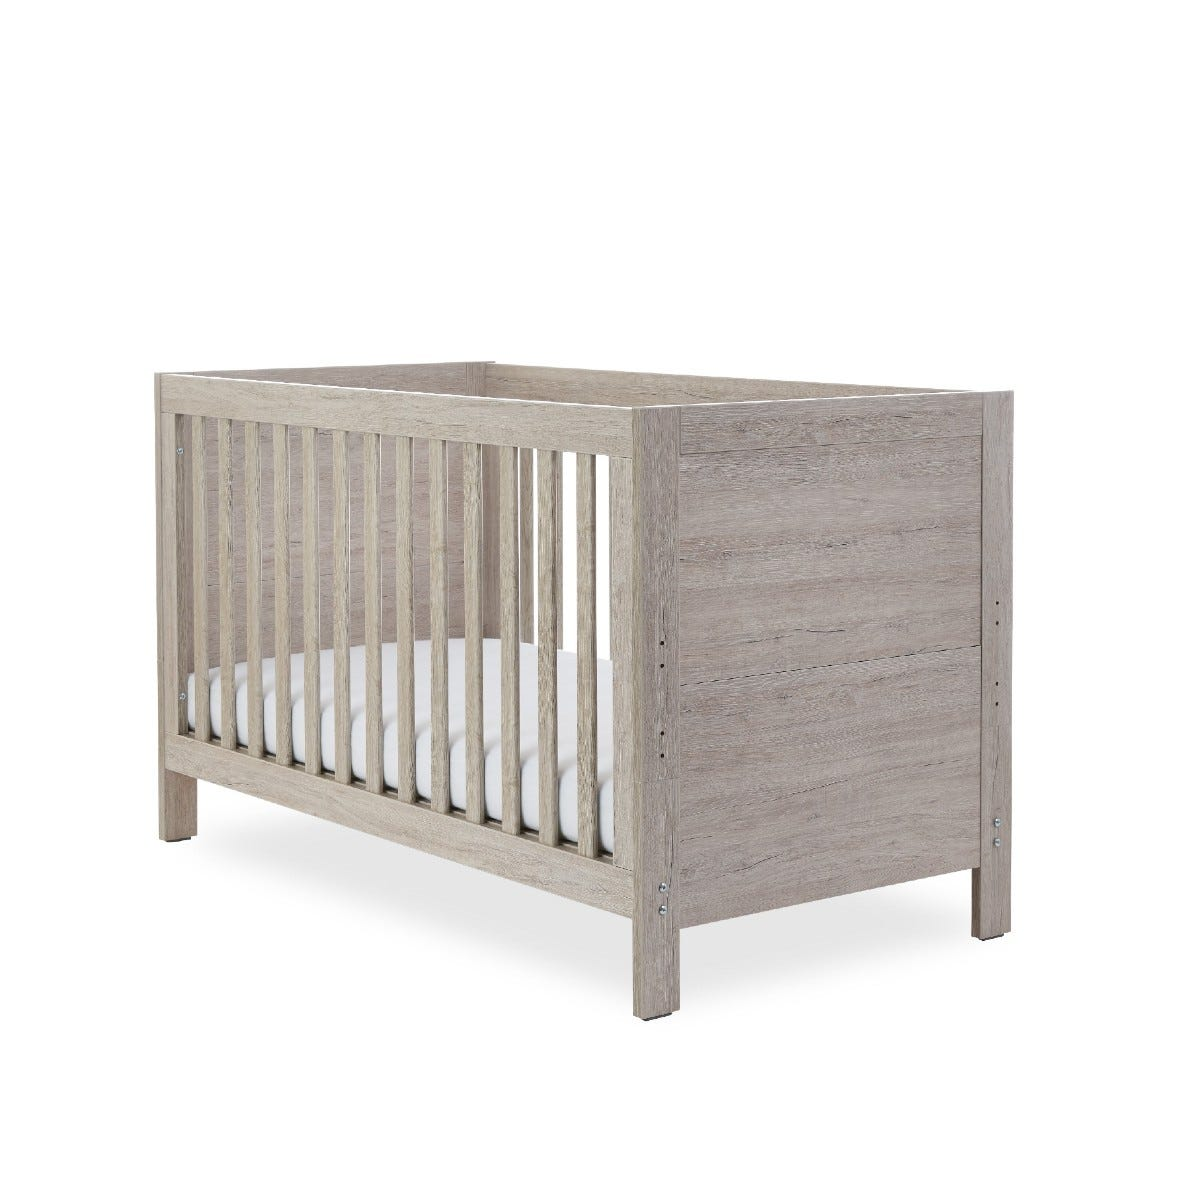 Ickle Bubba Grantham Cot Bed & Pocket Sprung Mattress Grey Oak